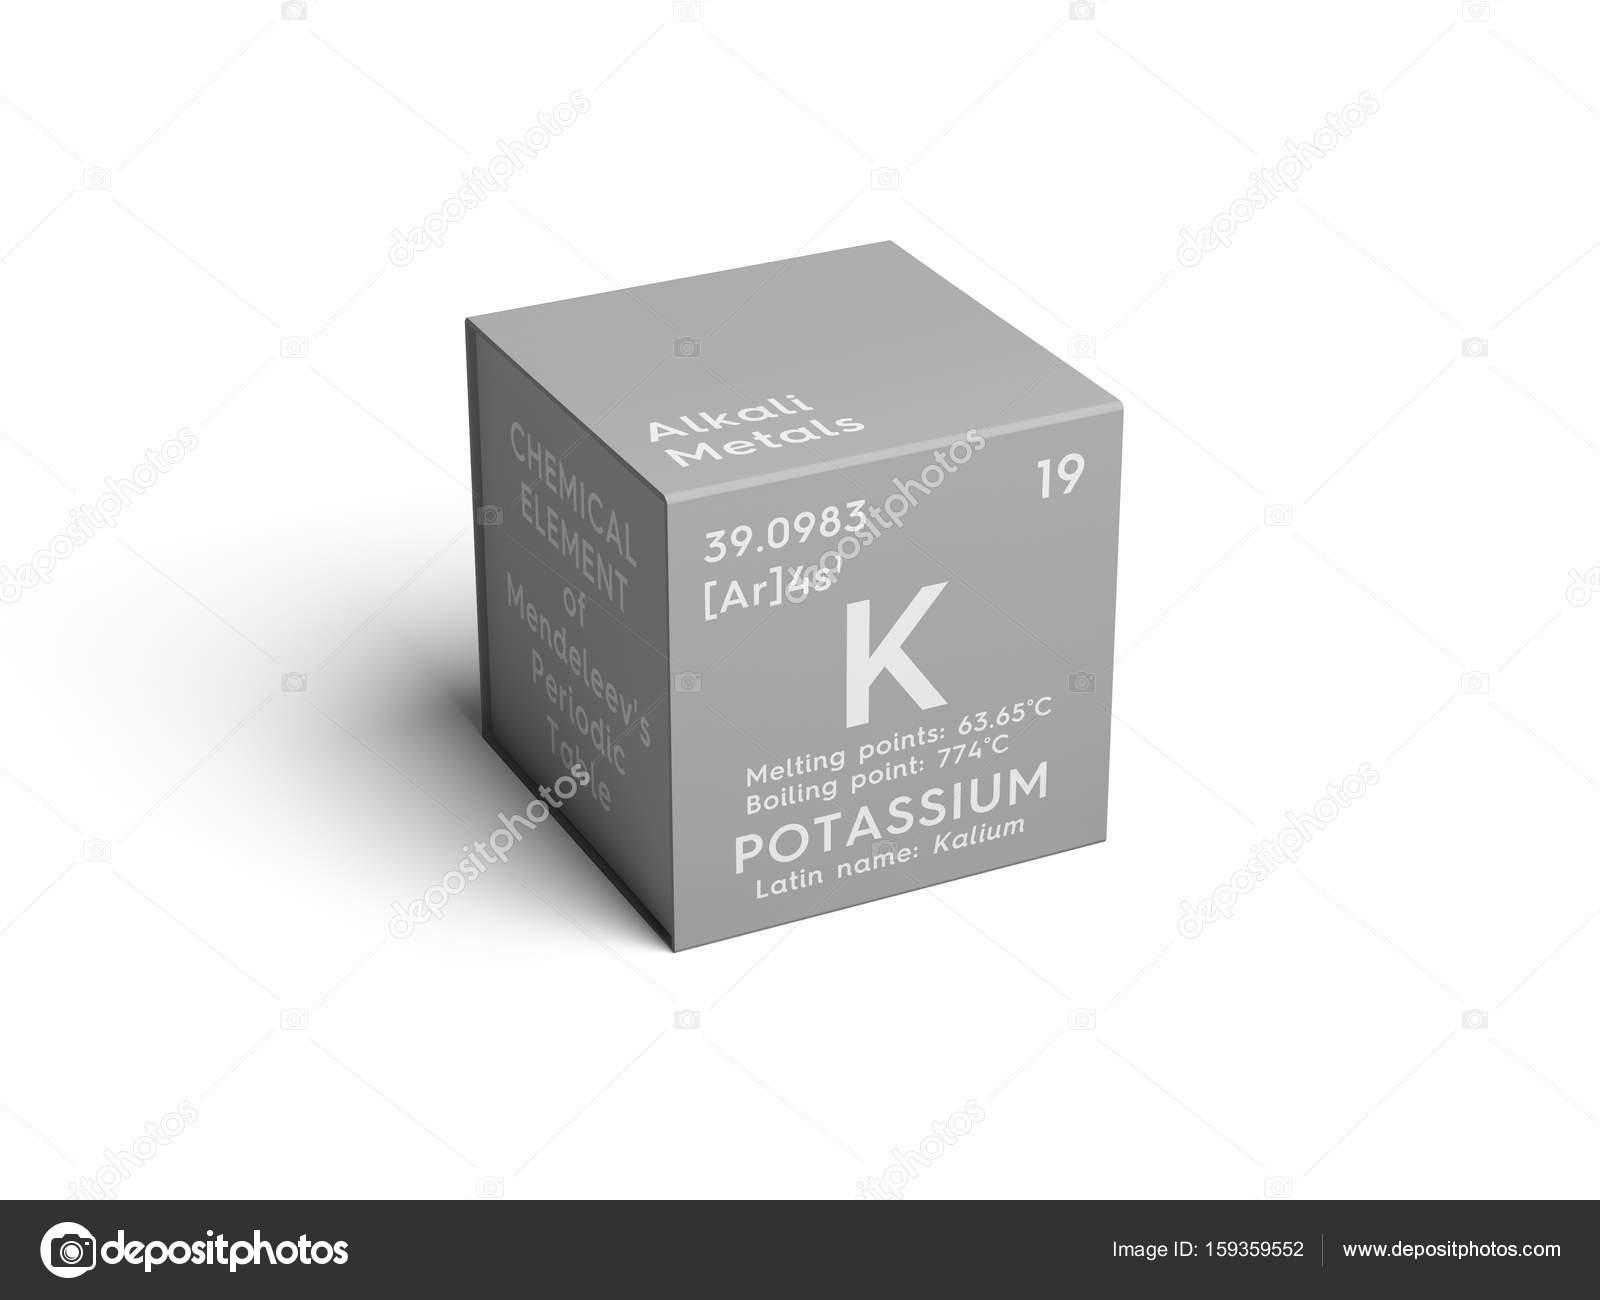 alkali metals chemical element of mendeleevs periodic table stock - Periodic Table Elements Alkali Metals